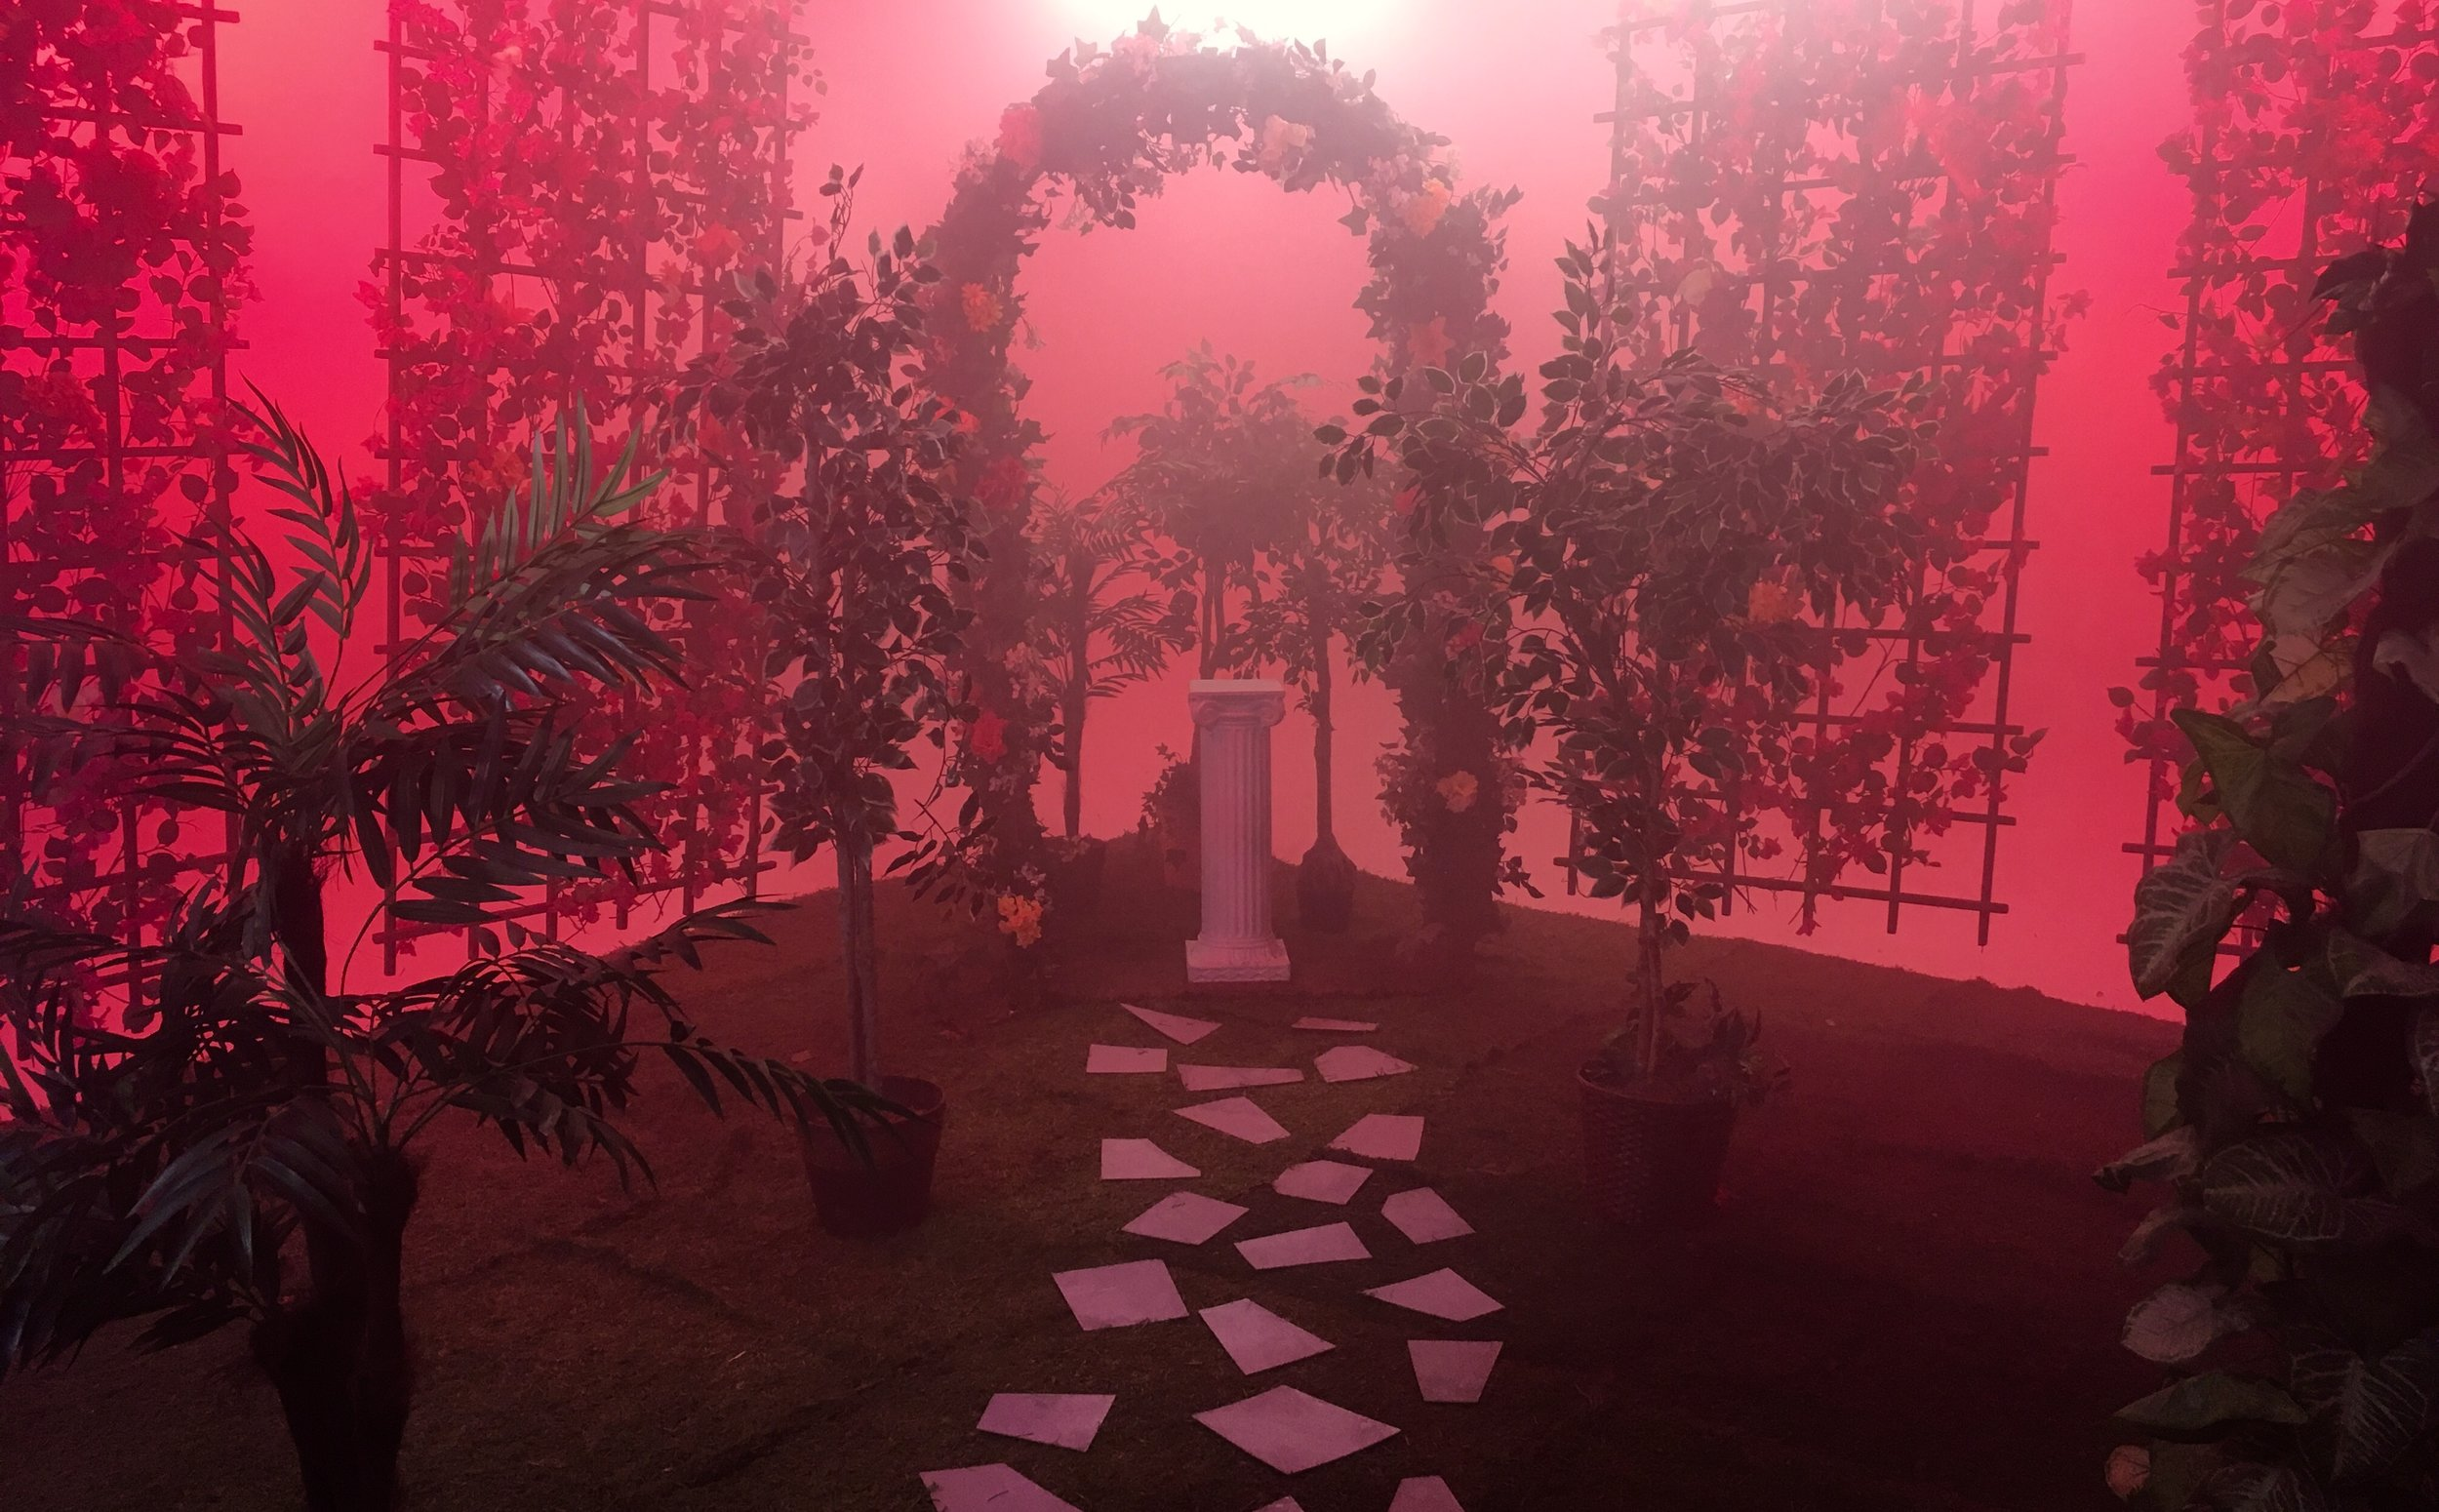 Secret Garden scene with pedestal for main prop